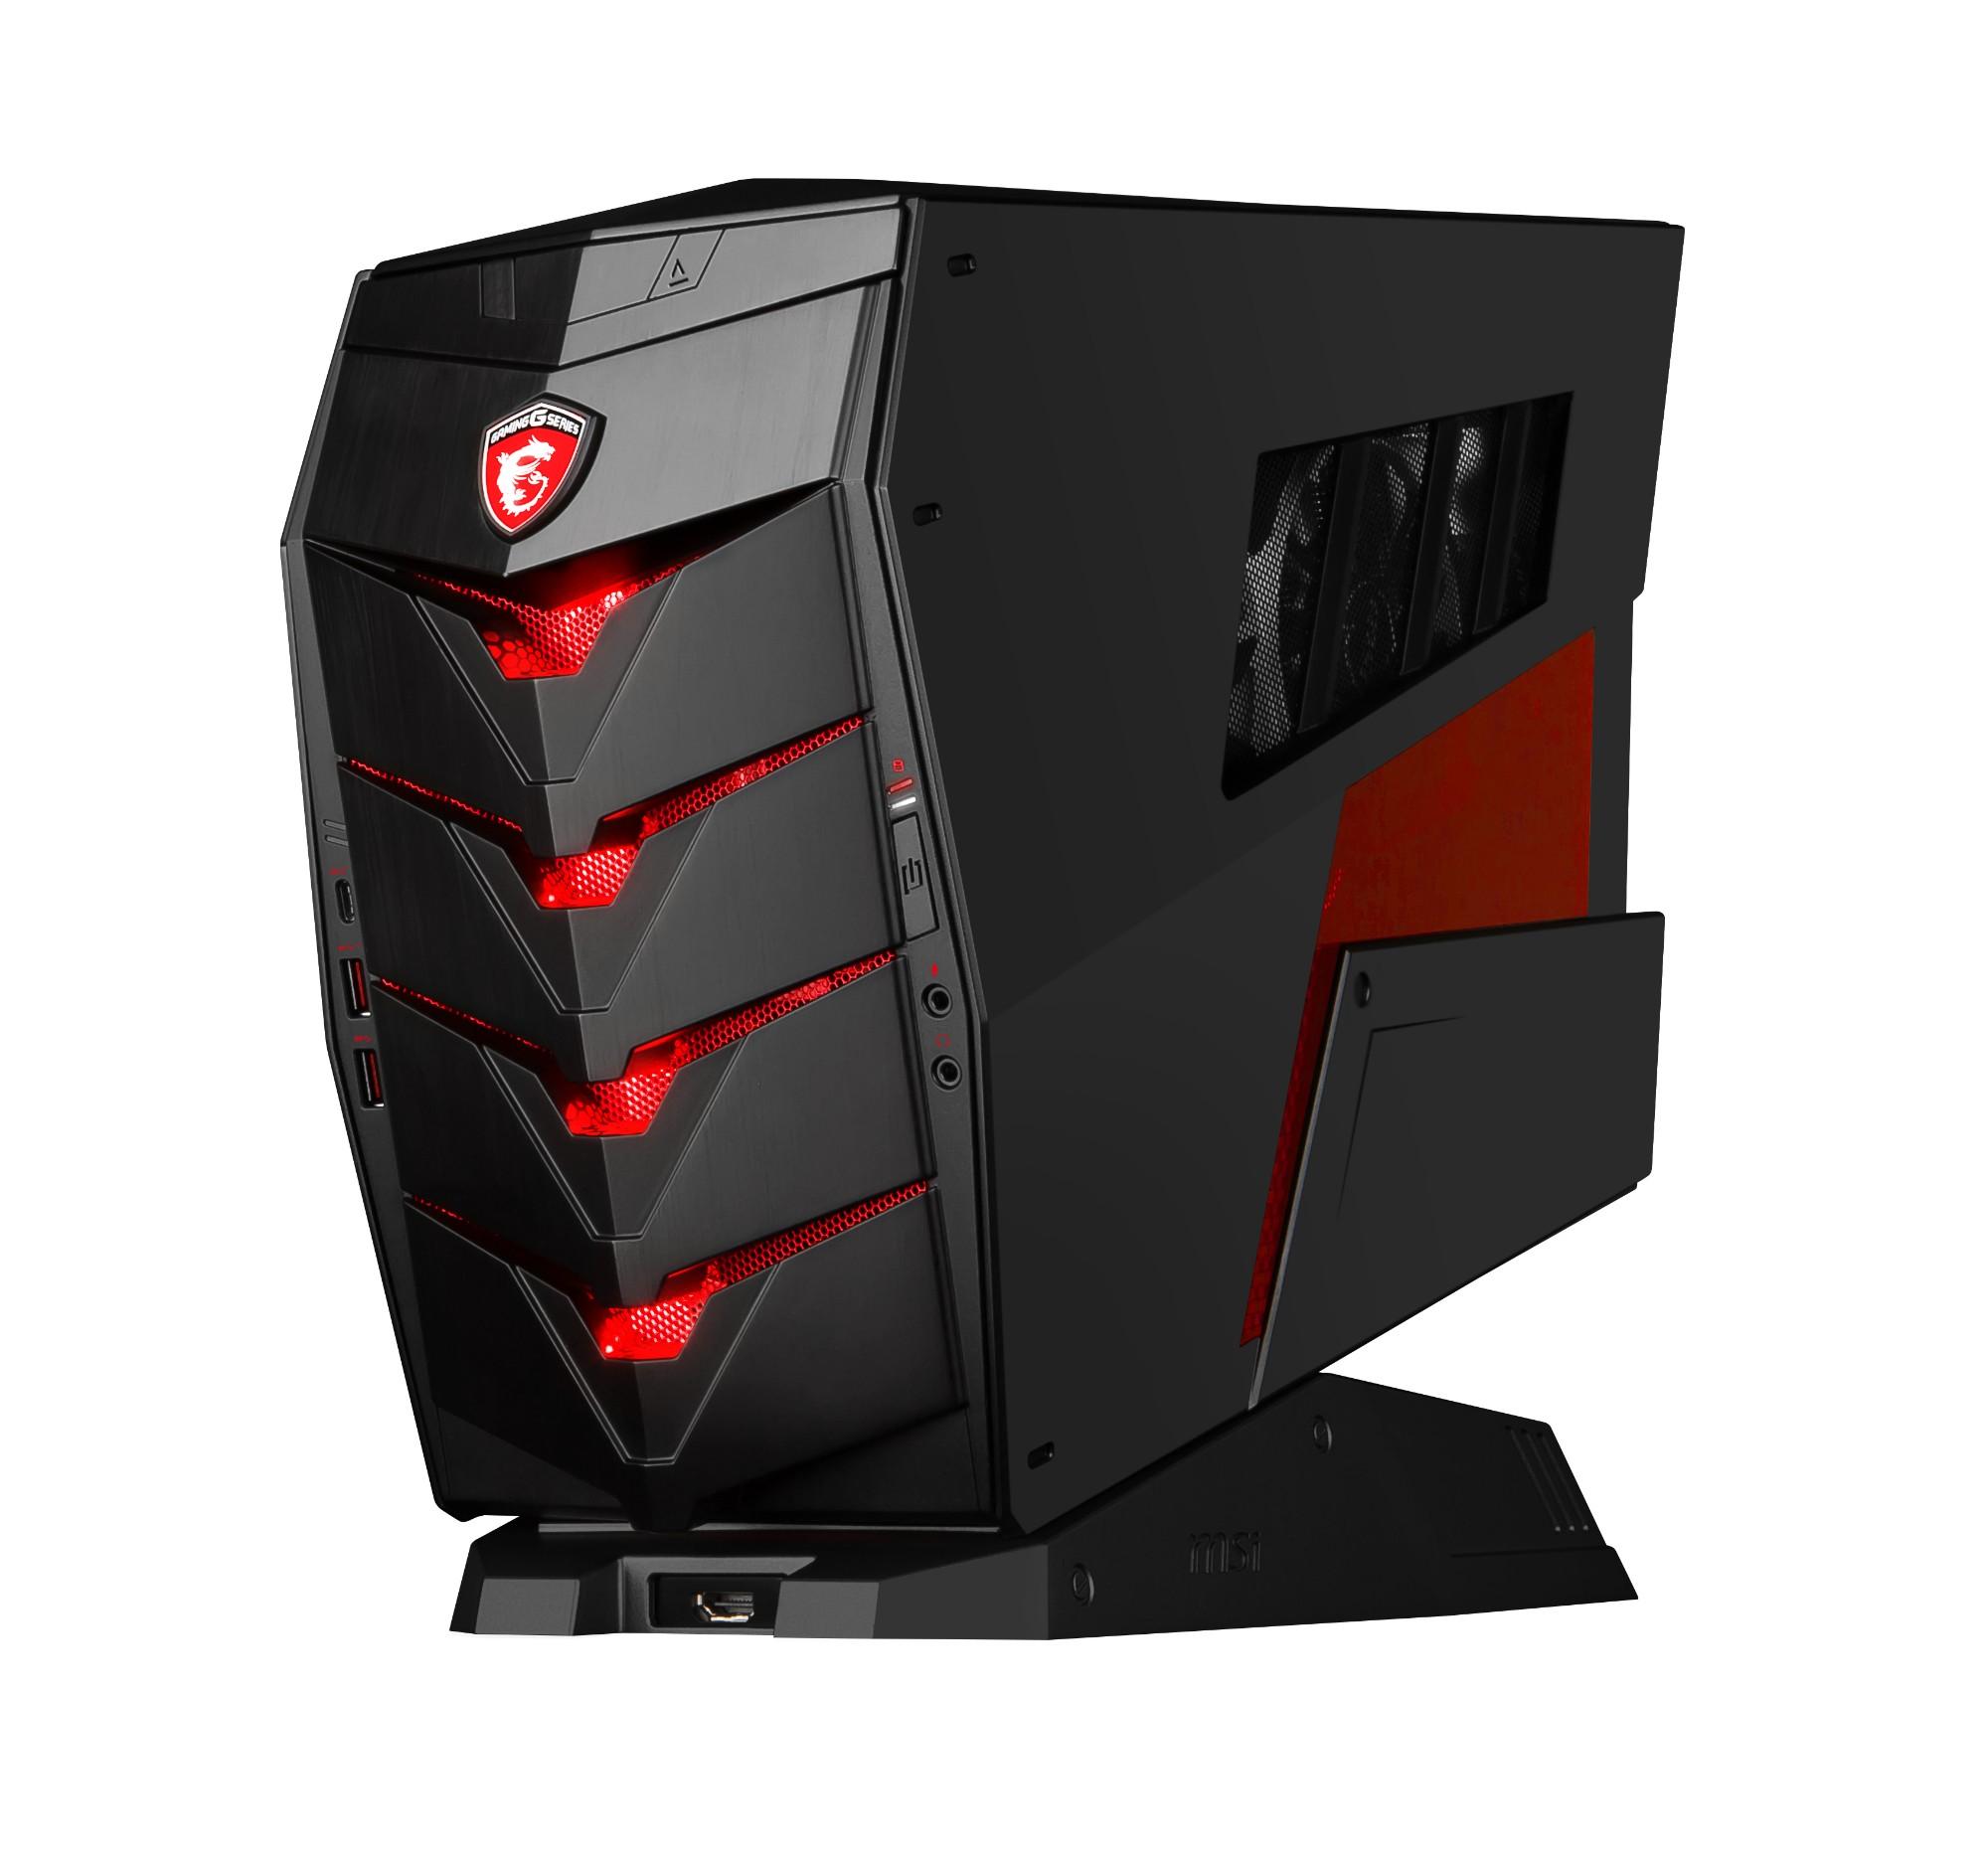 MSI Aegis X-002EU 4GHz i7-6700K Desktop Black PC